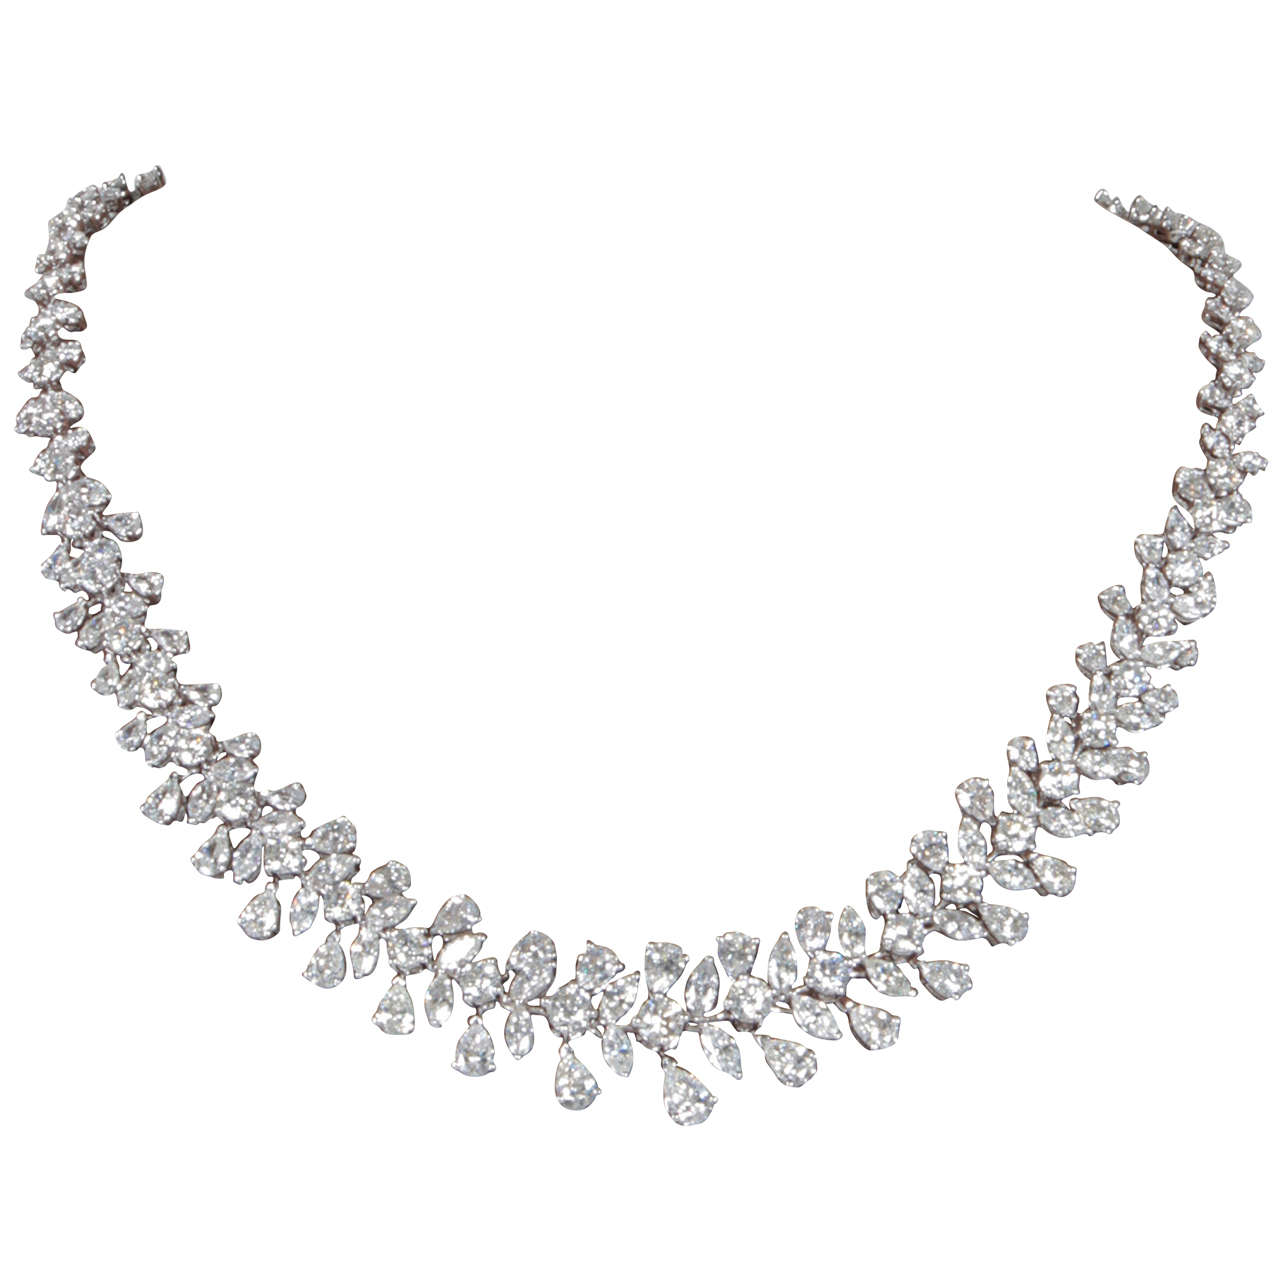 Classic Diamond Wreath Necklace